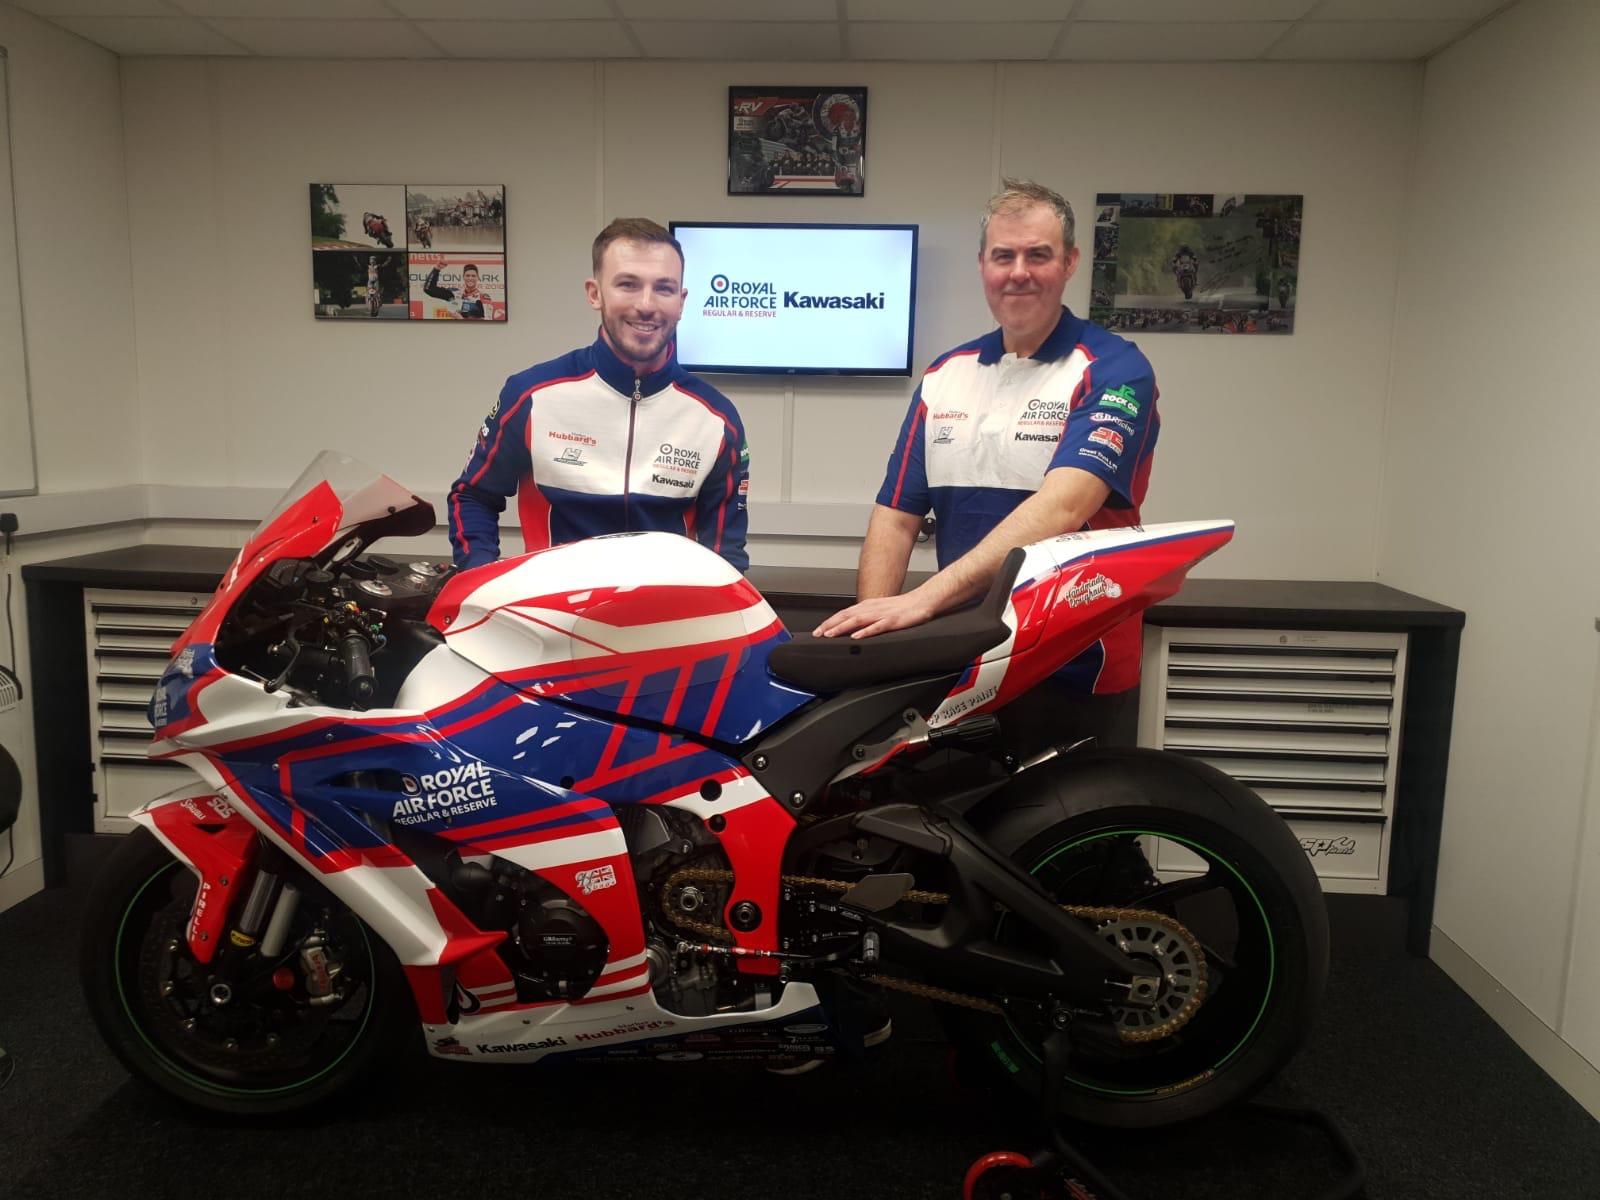 RAF Regular & Reserves Kawasaki Reaffirm Commitment To Ulster GP Super Twins Victor Jordan